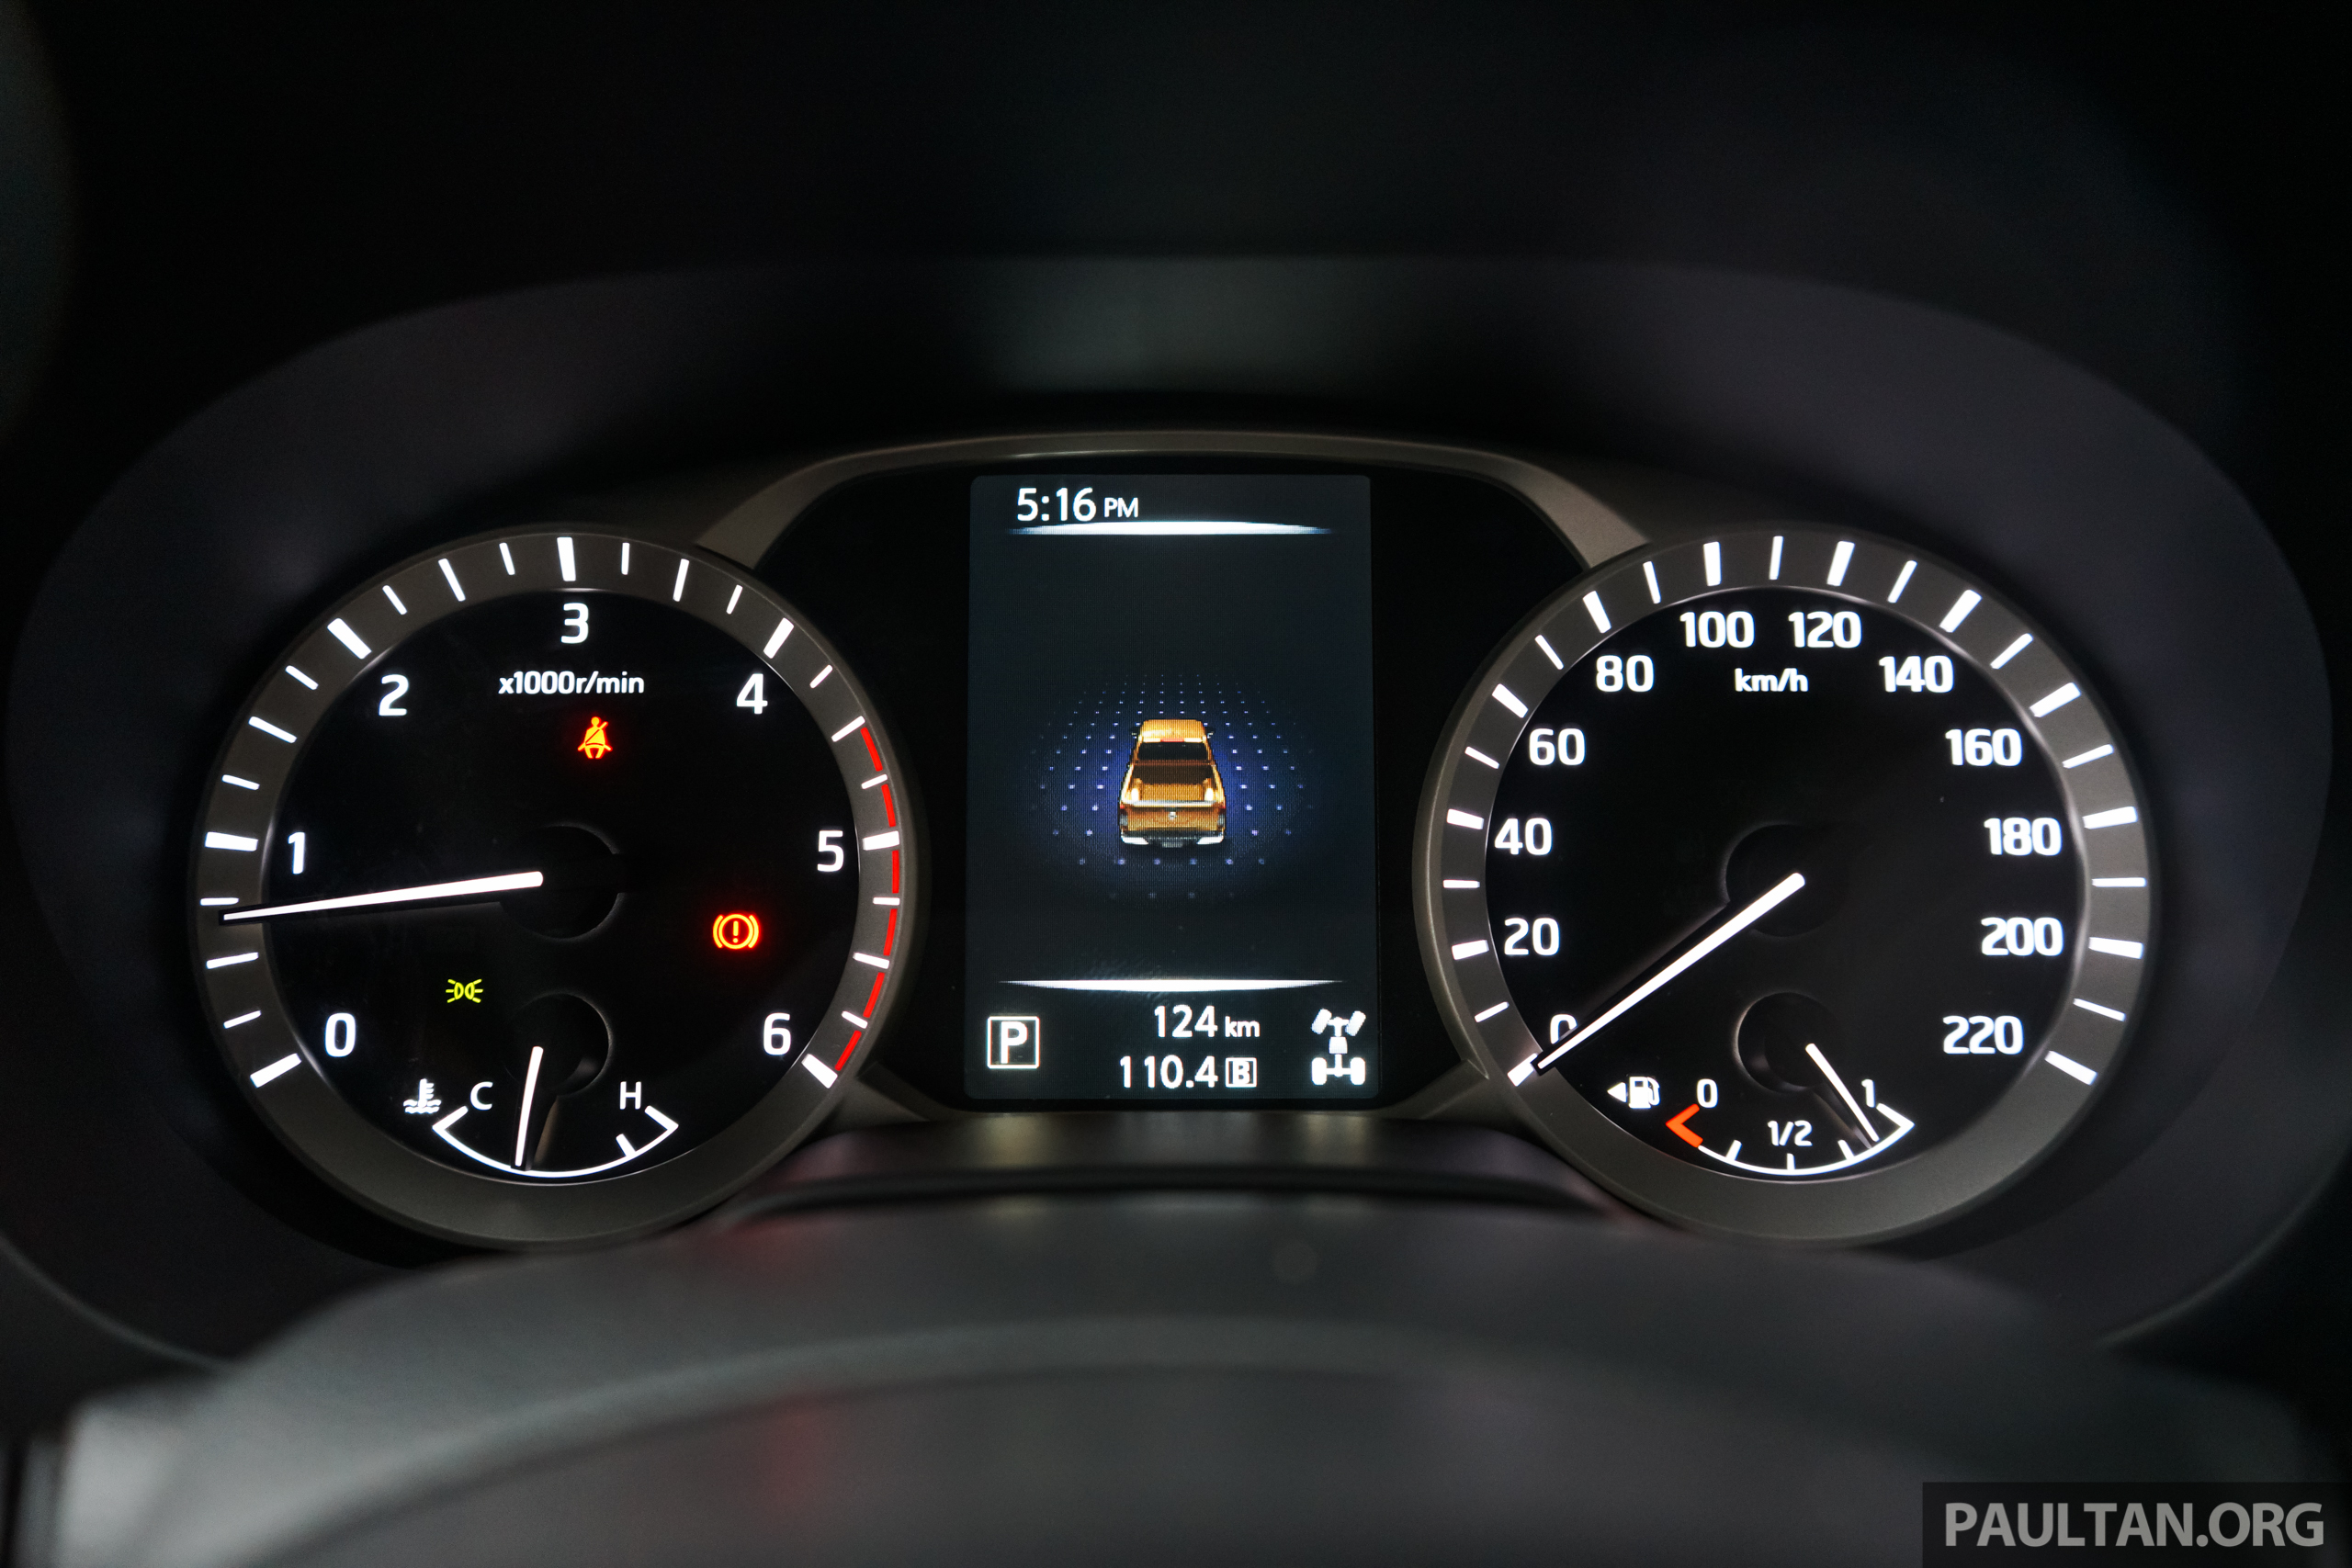 Driven Nissan Np300 Navara Review In Malaysia Image 425025